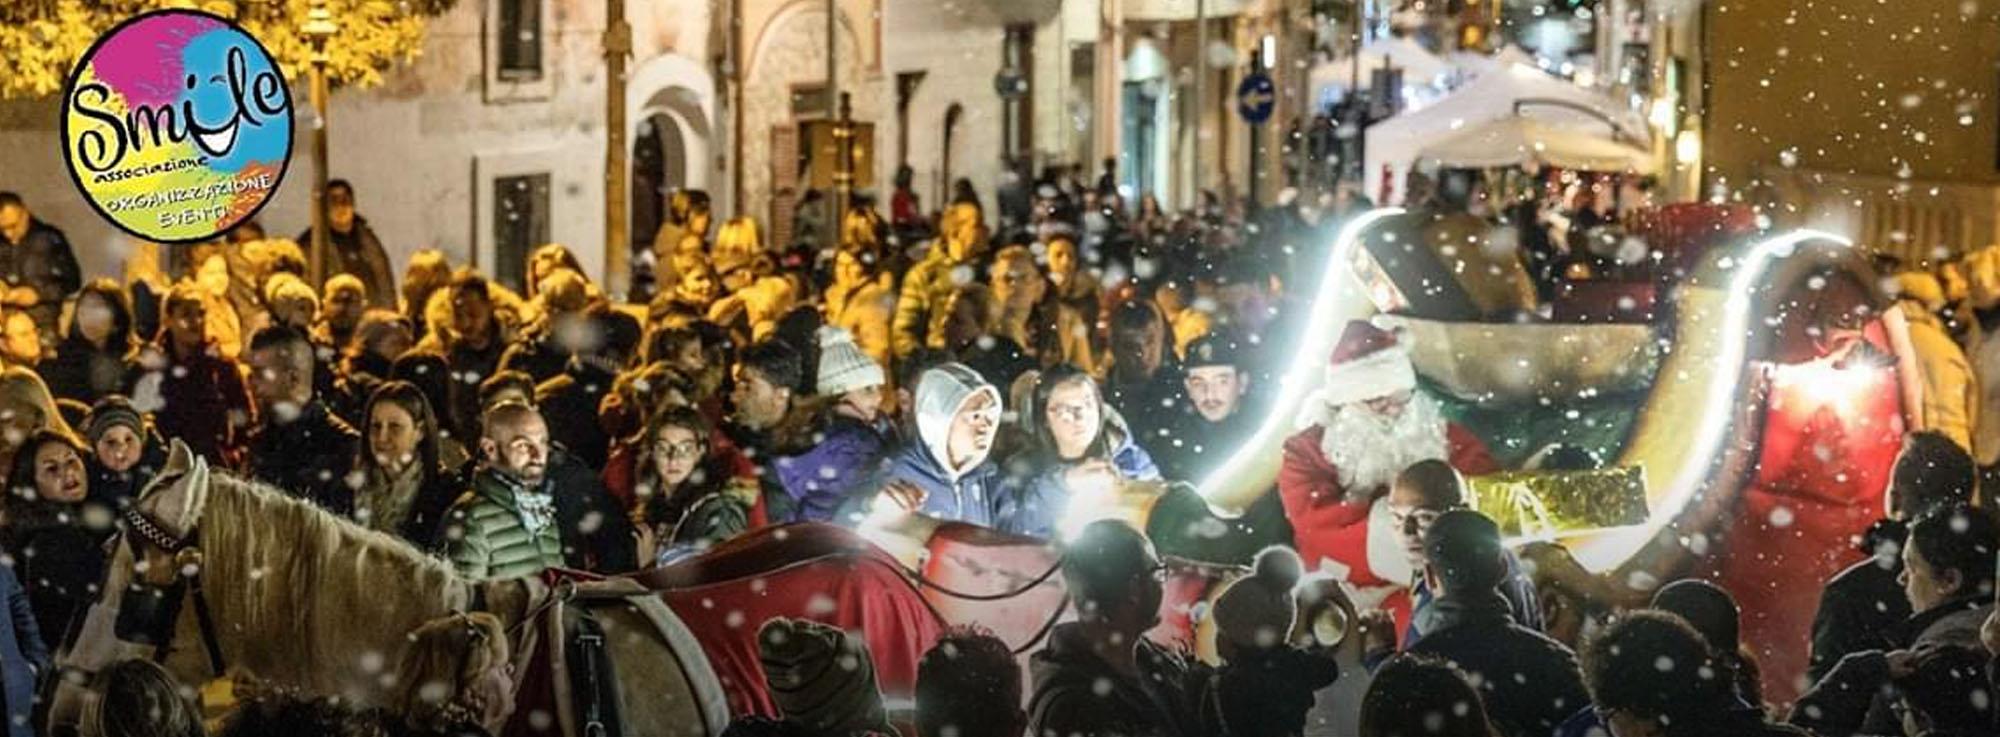 Faggiano: Magic Christmas